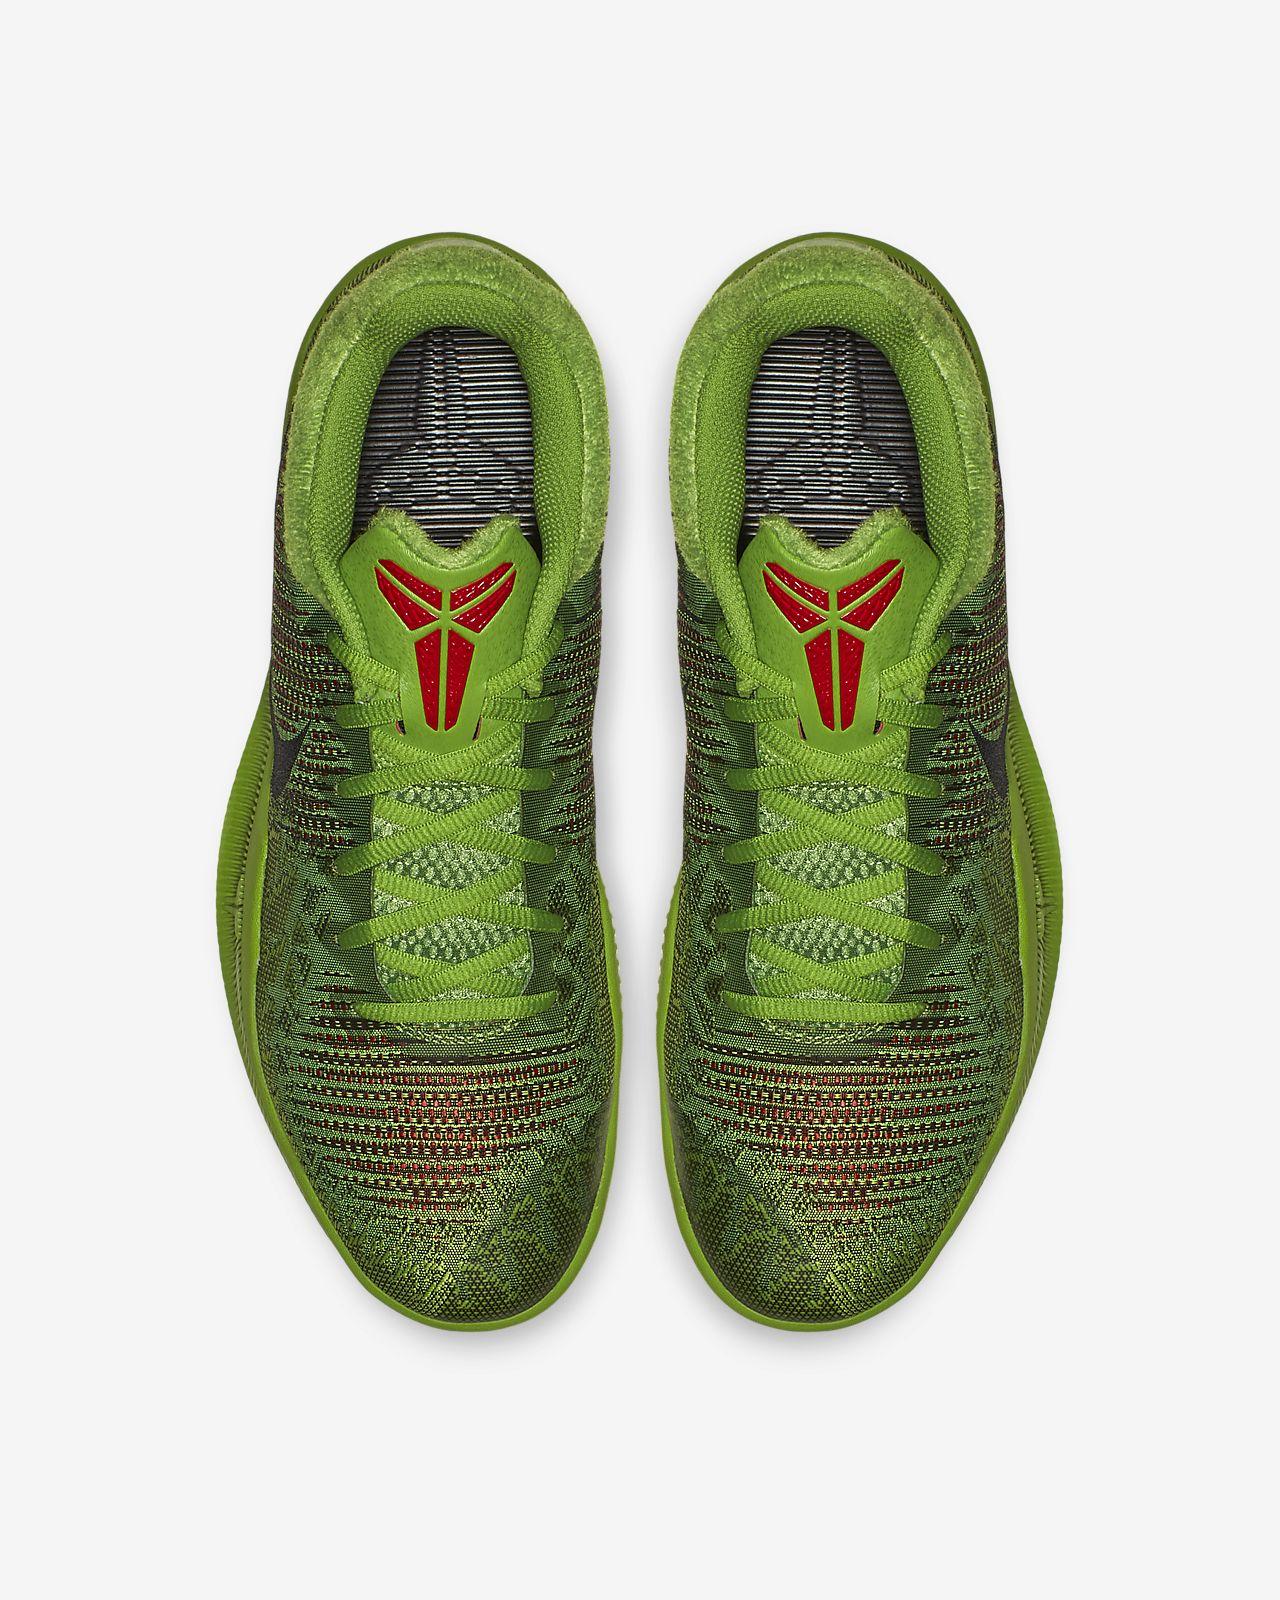 270219954a7 Nike Mamba Rage Men s Basketball Shoe. Nike.com